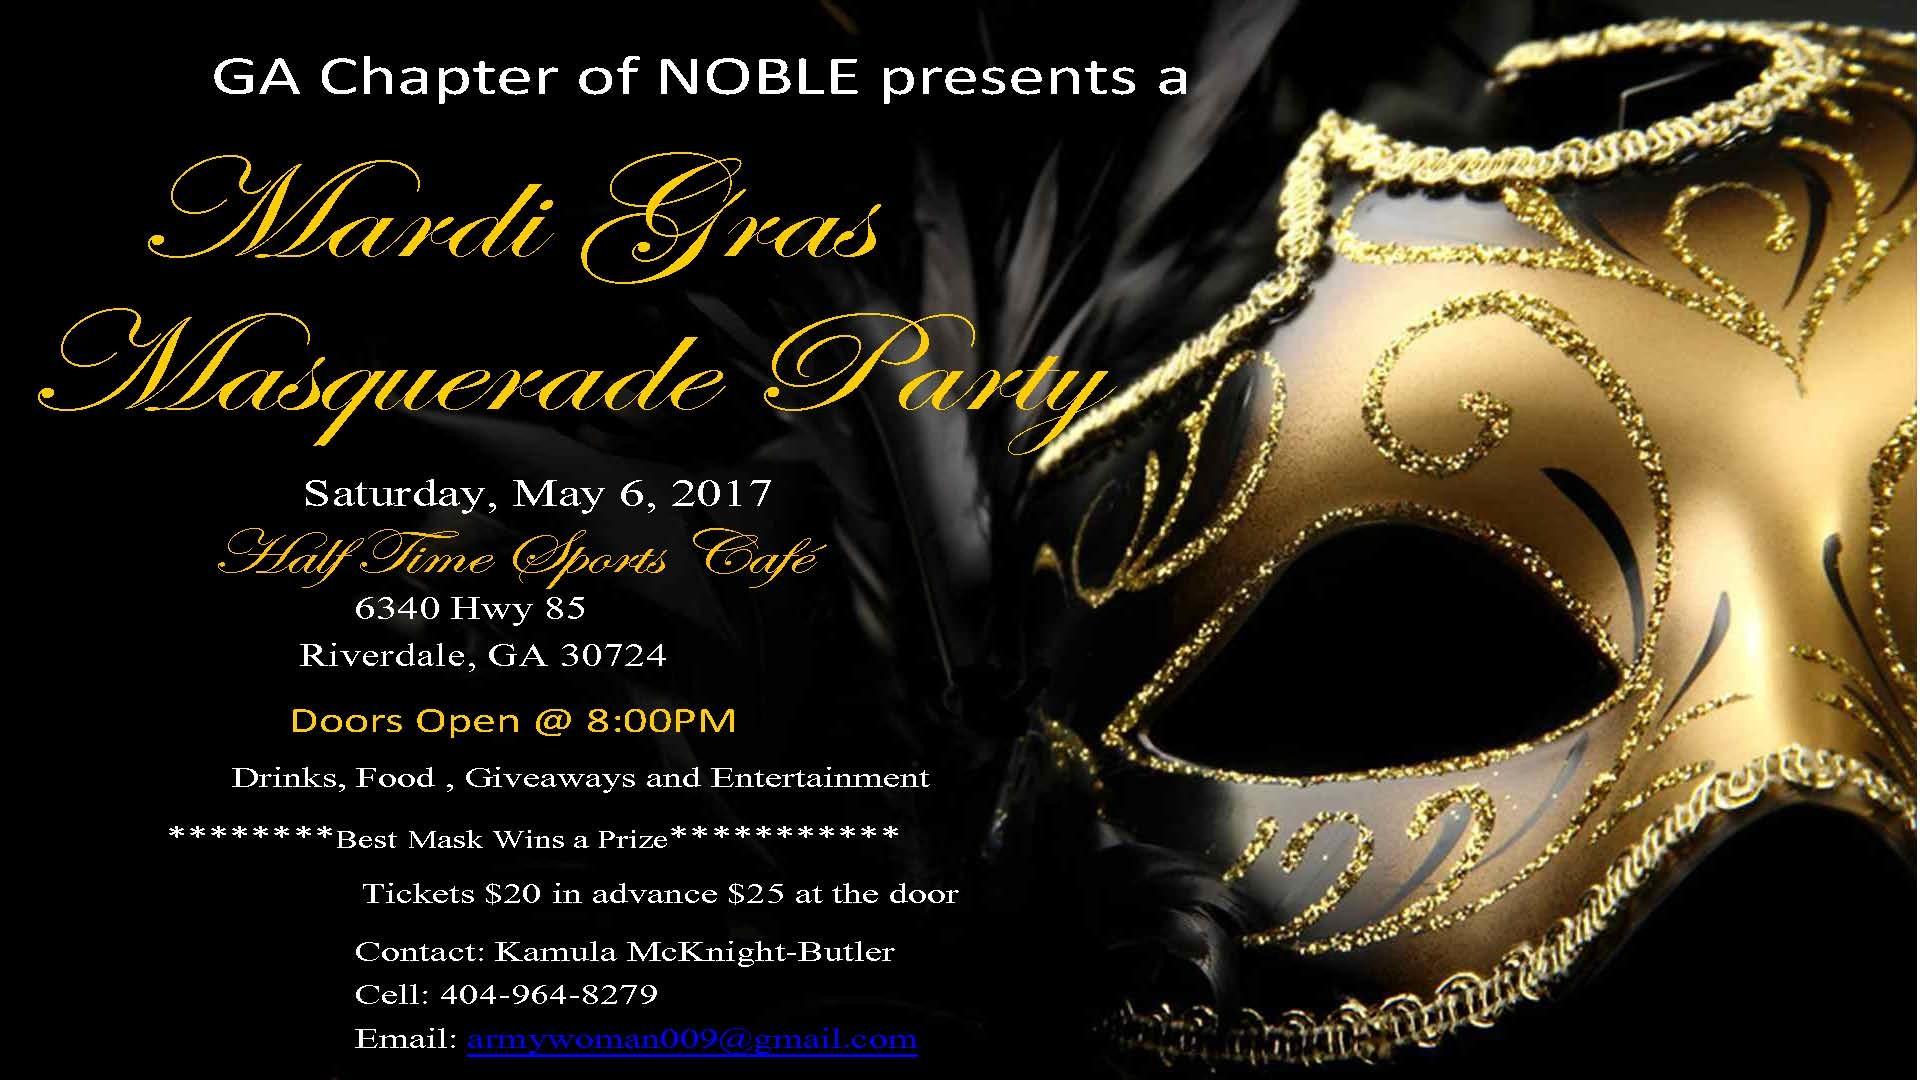 NOBLE Mardi Gras Masquerade Party